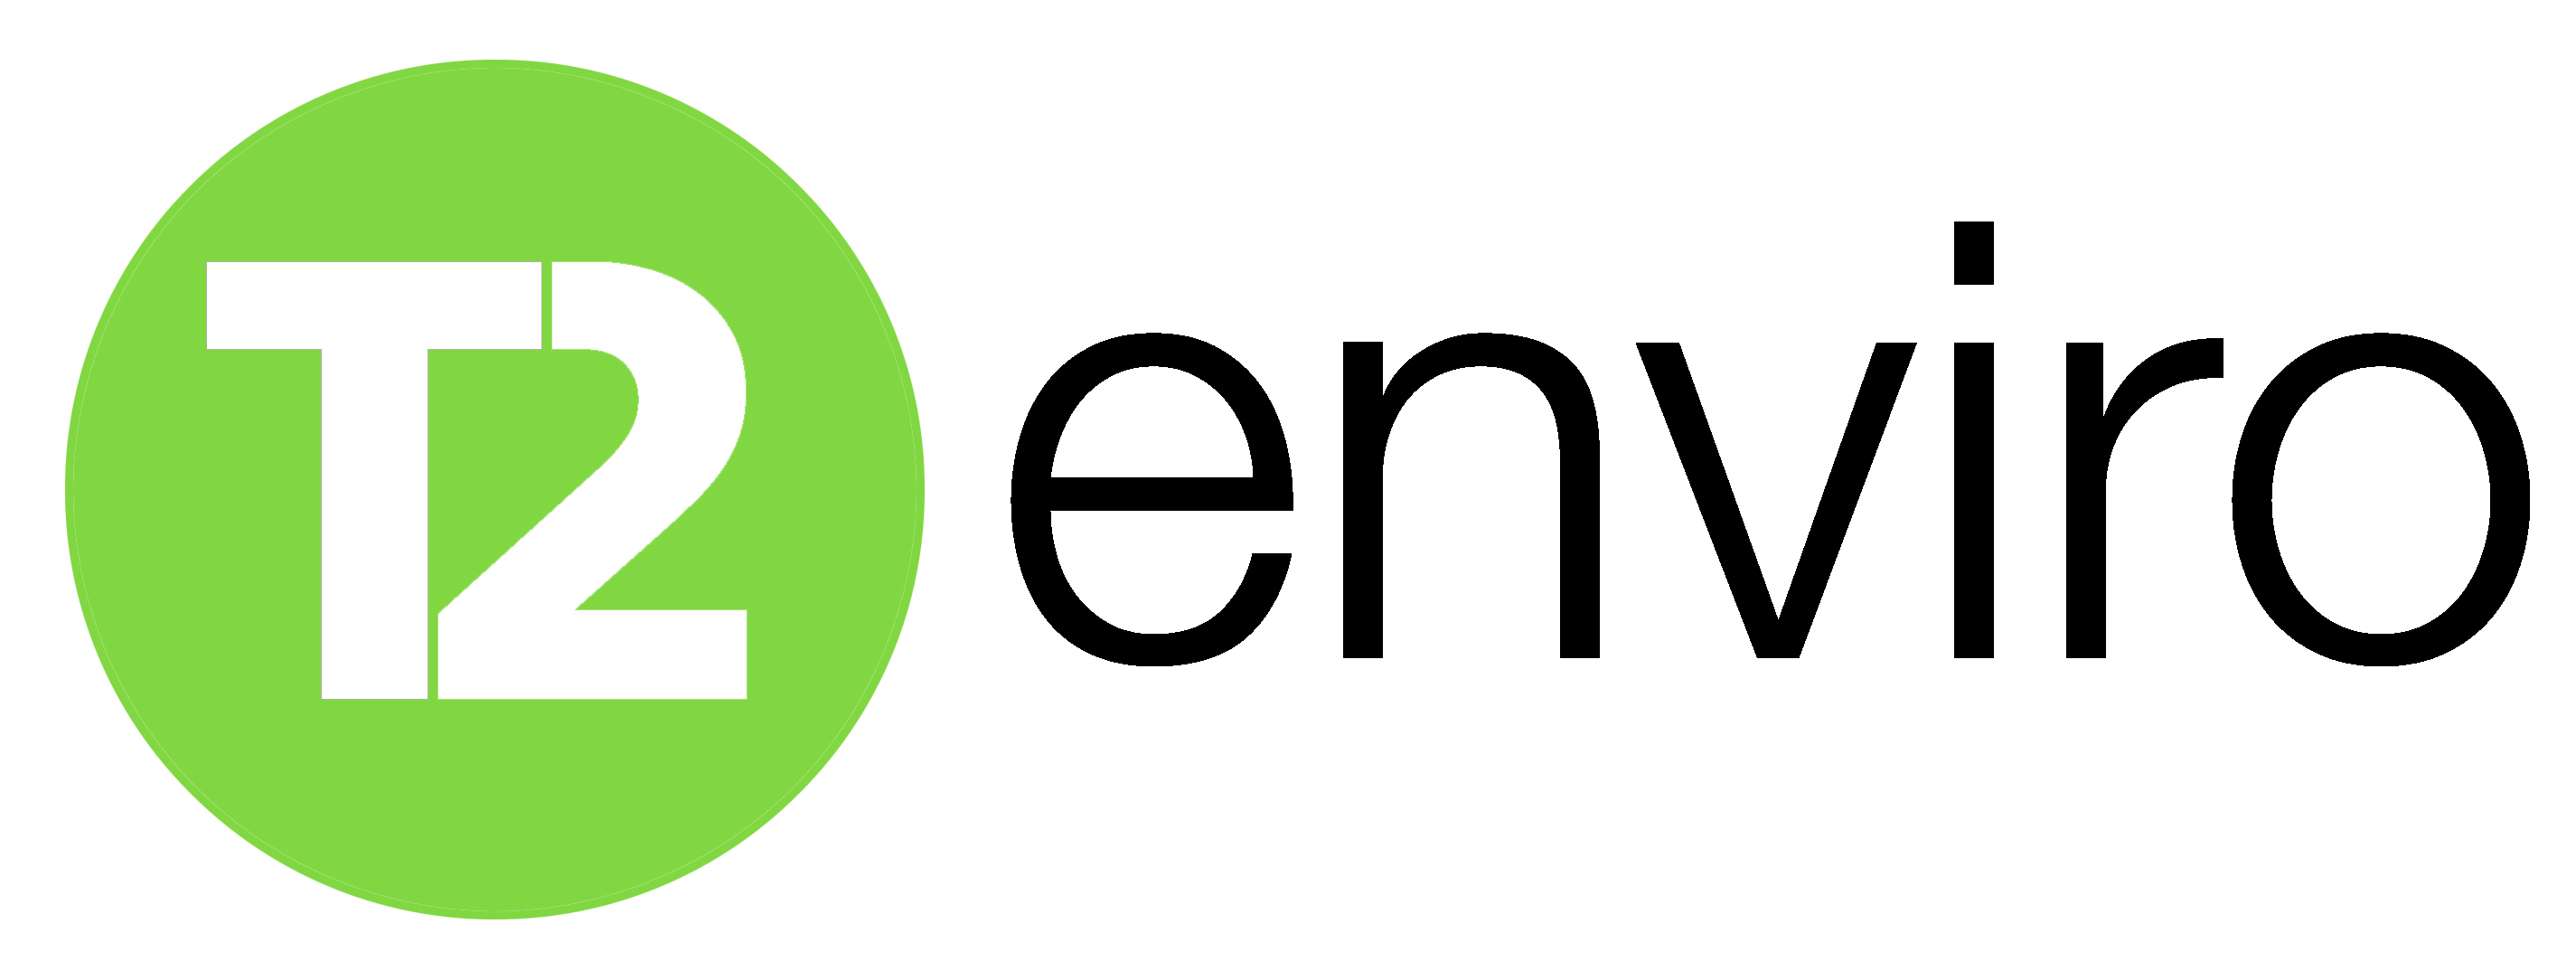 T2 Environmental Pty Ltd Logo